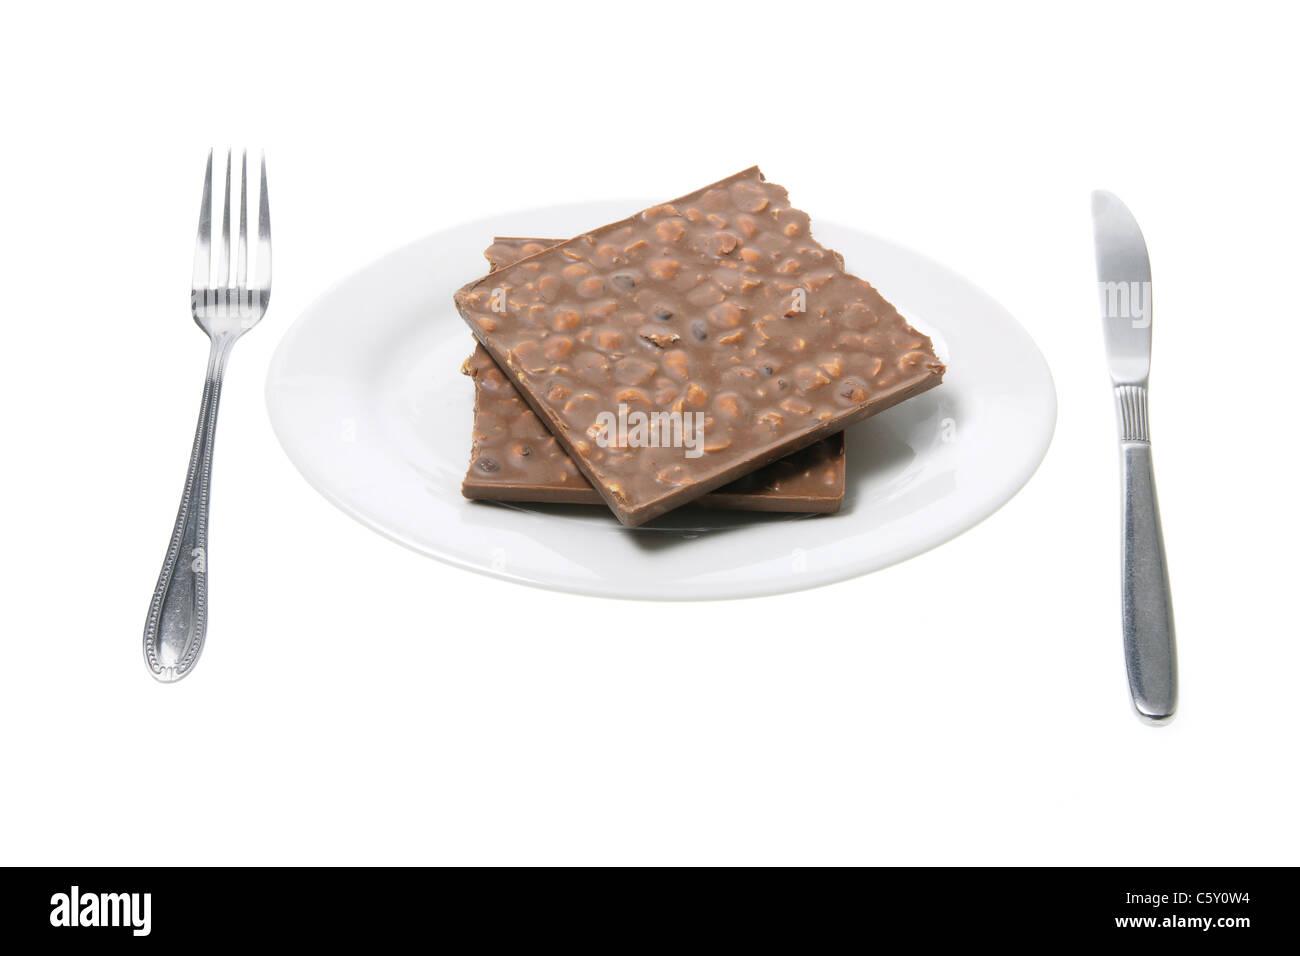 Chocolate Bar on Plate - Stock Image